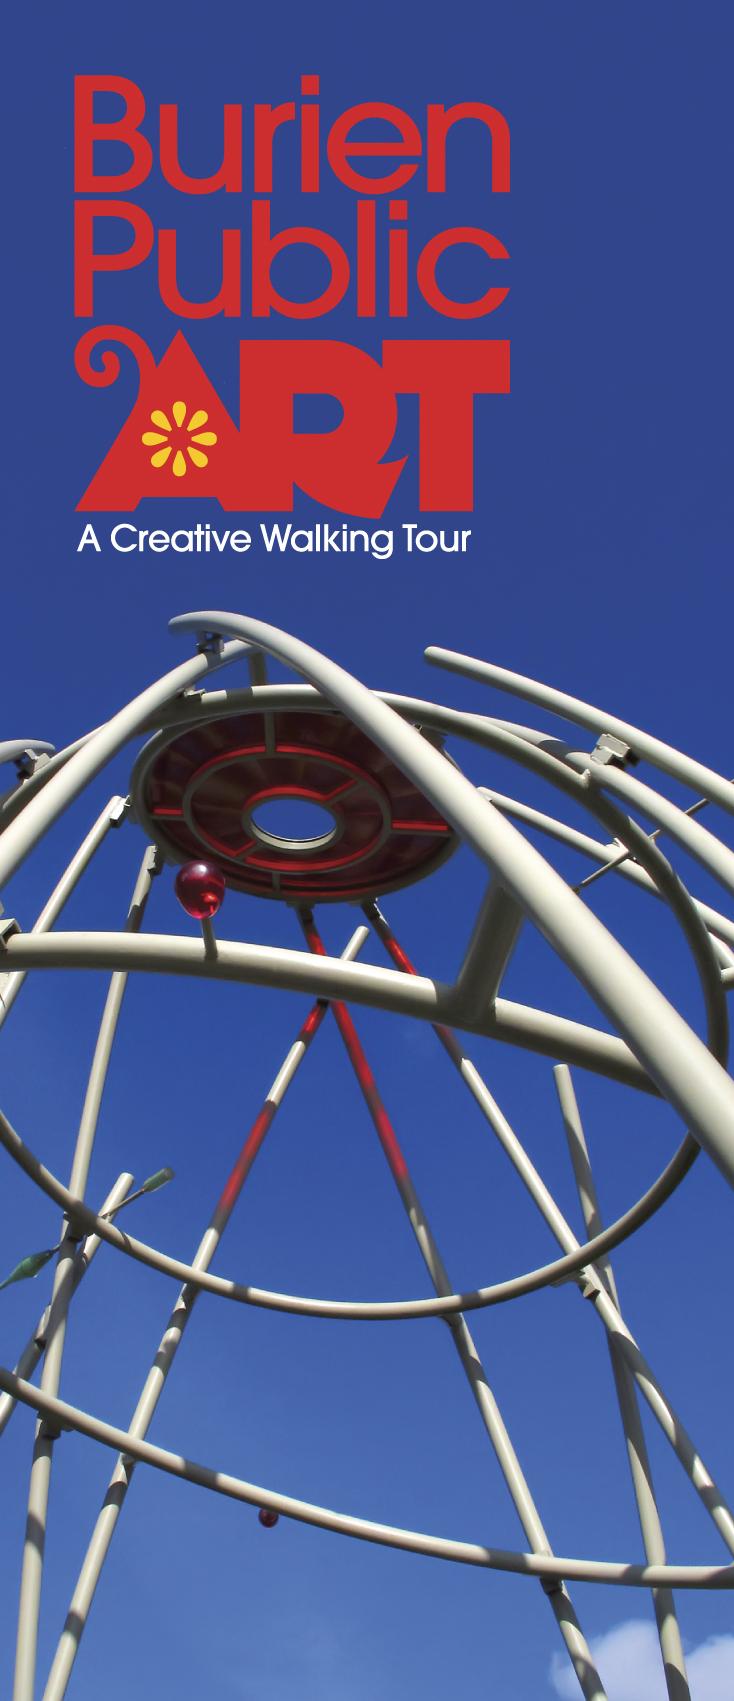 BURART-Public Art Brochure Cover Image